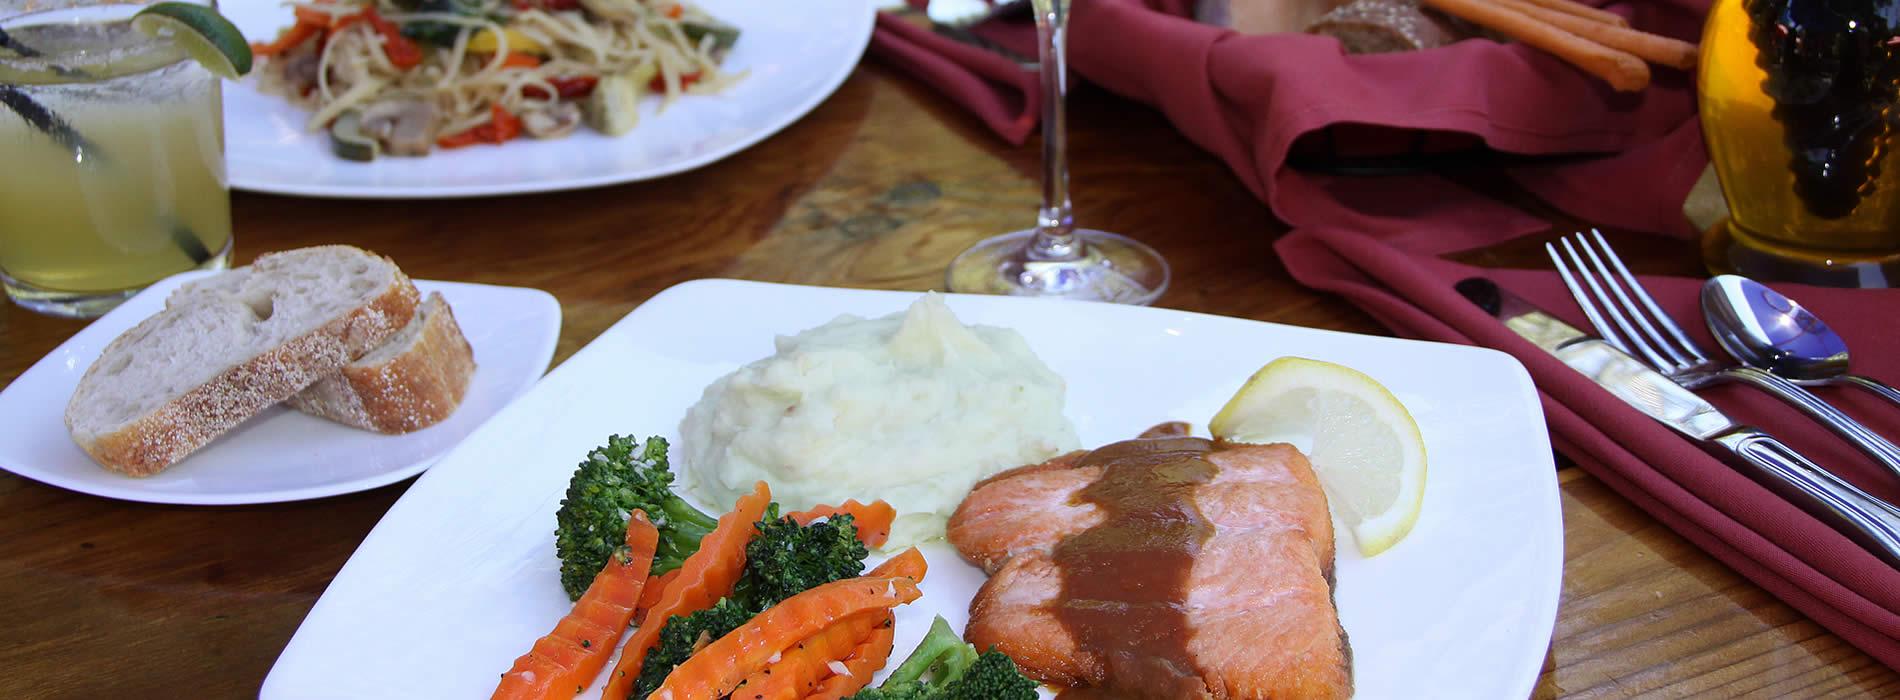 big sur best restaurants - big sur river inn & restaurant